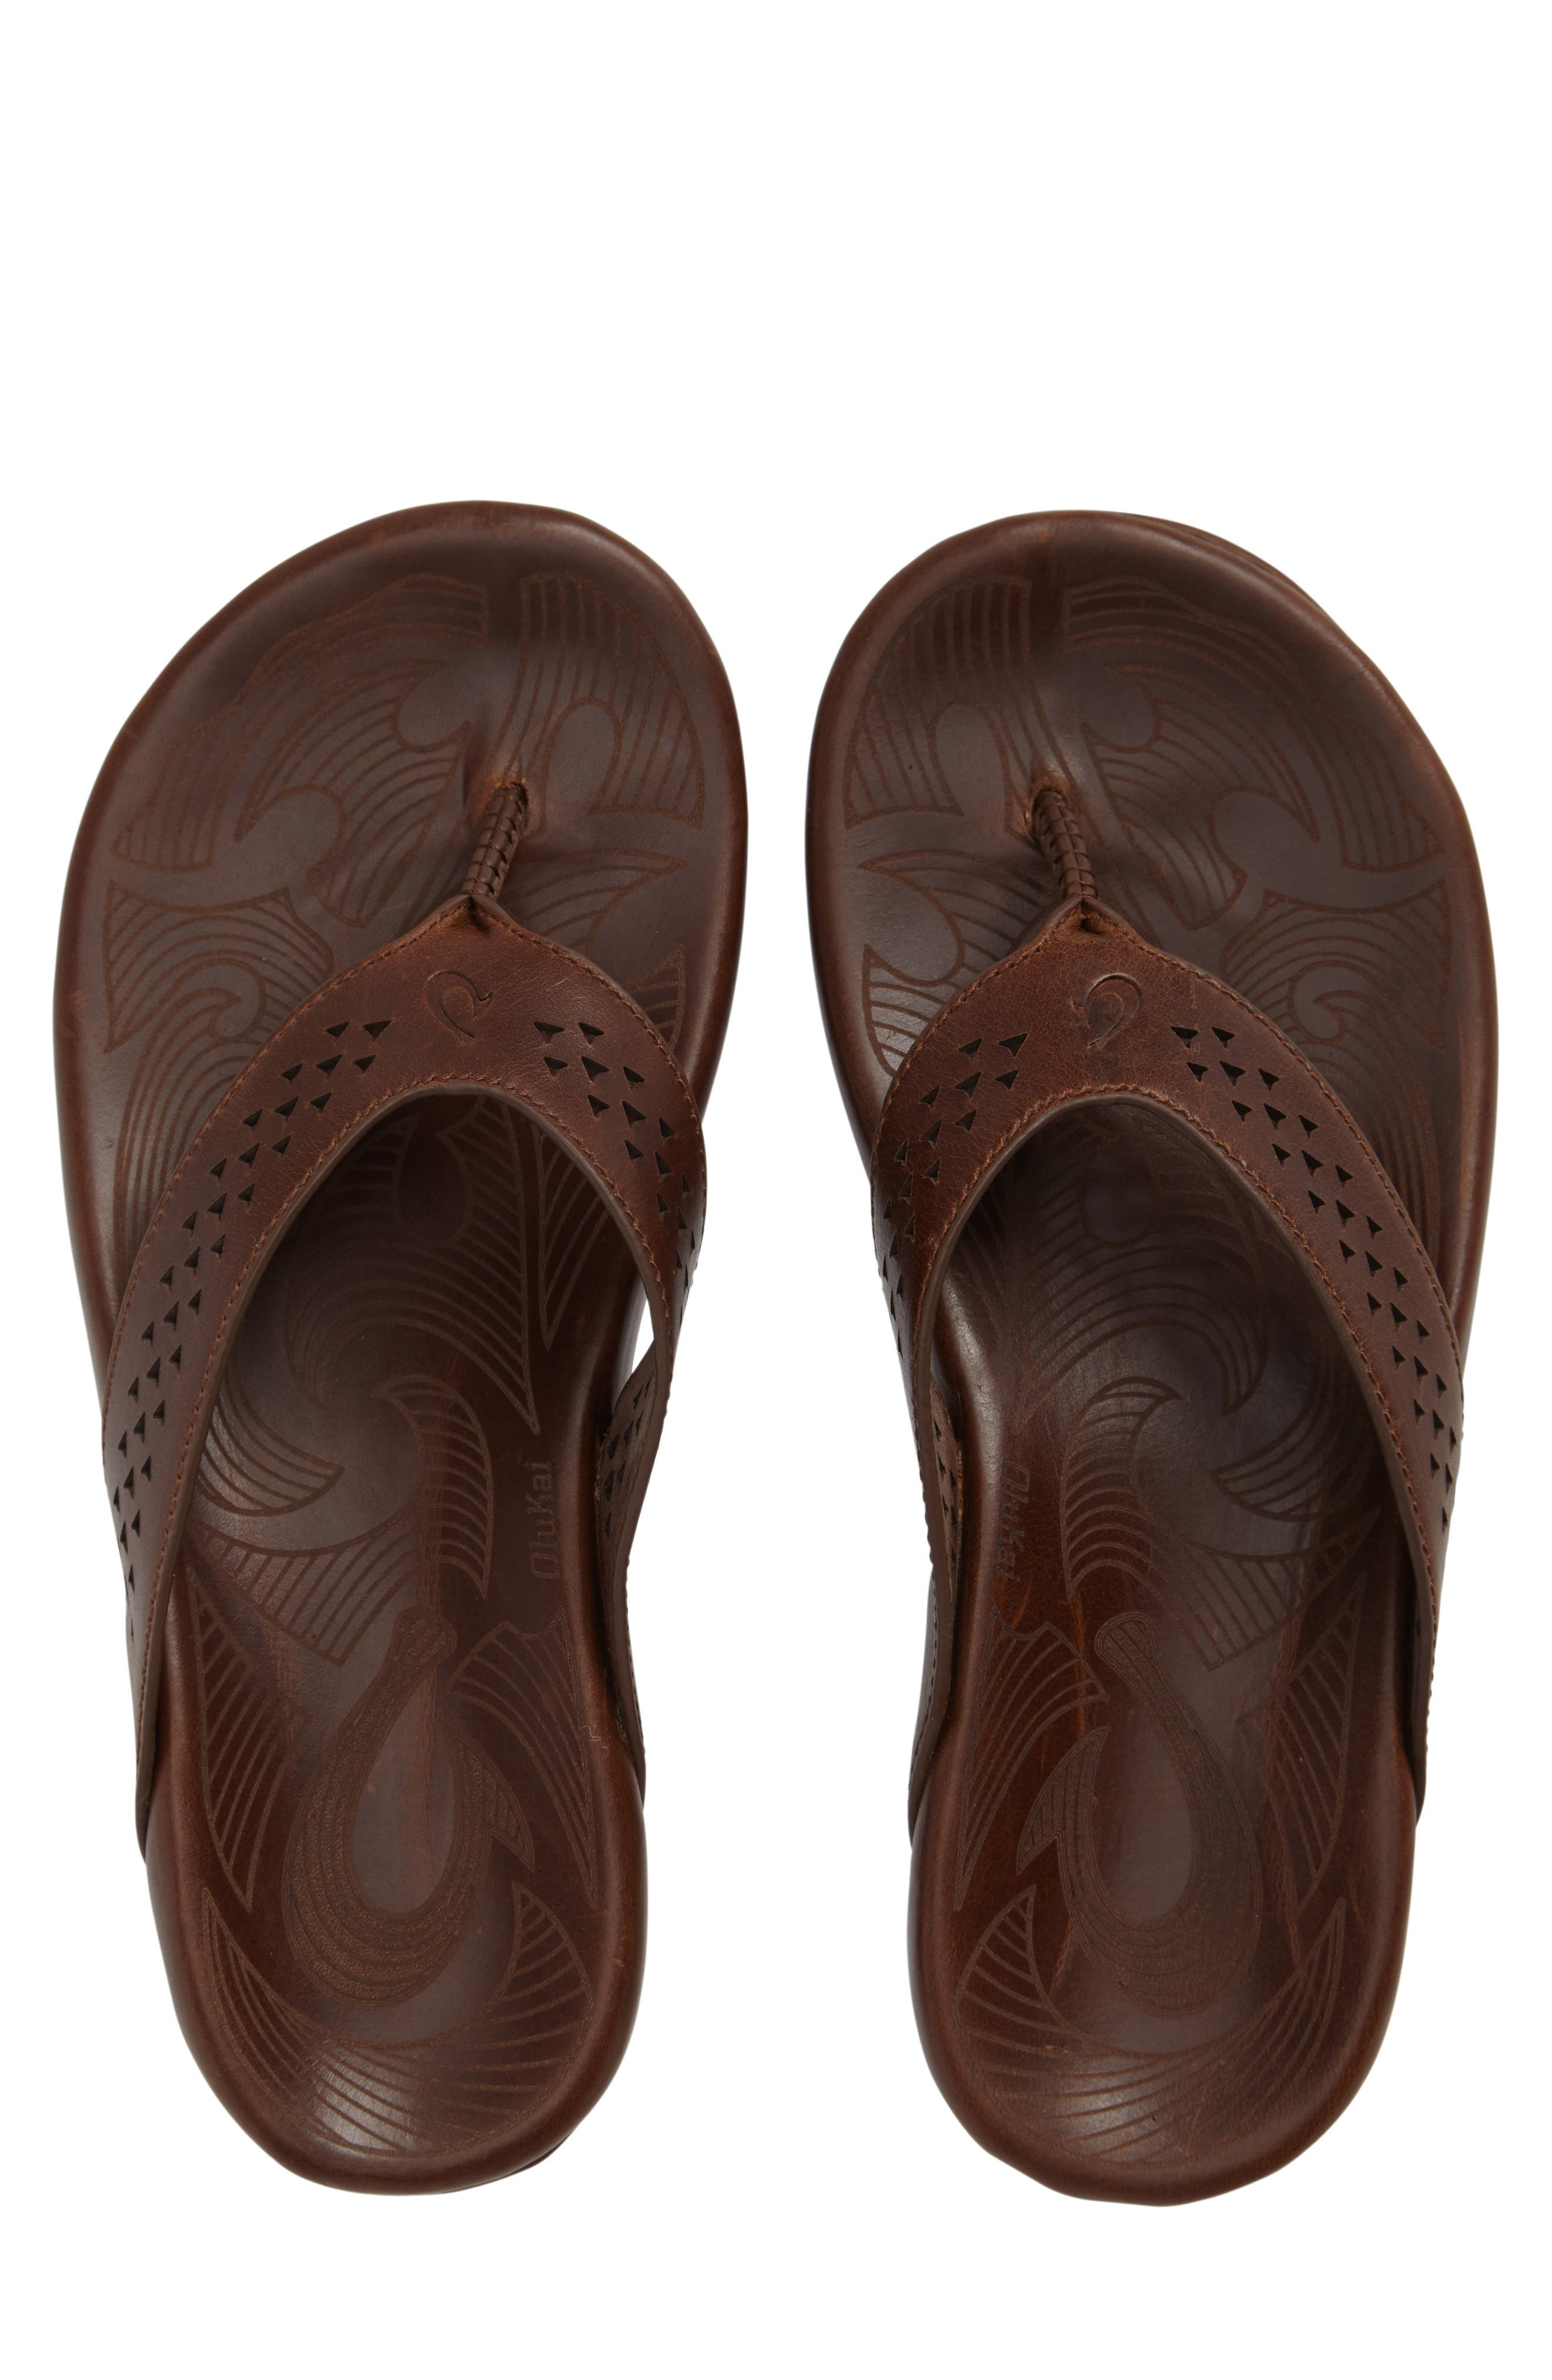 Kohana Flip Flop,                         Main,                         color, Toffee/ Toffee Leather